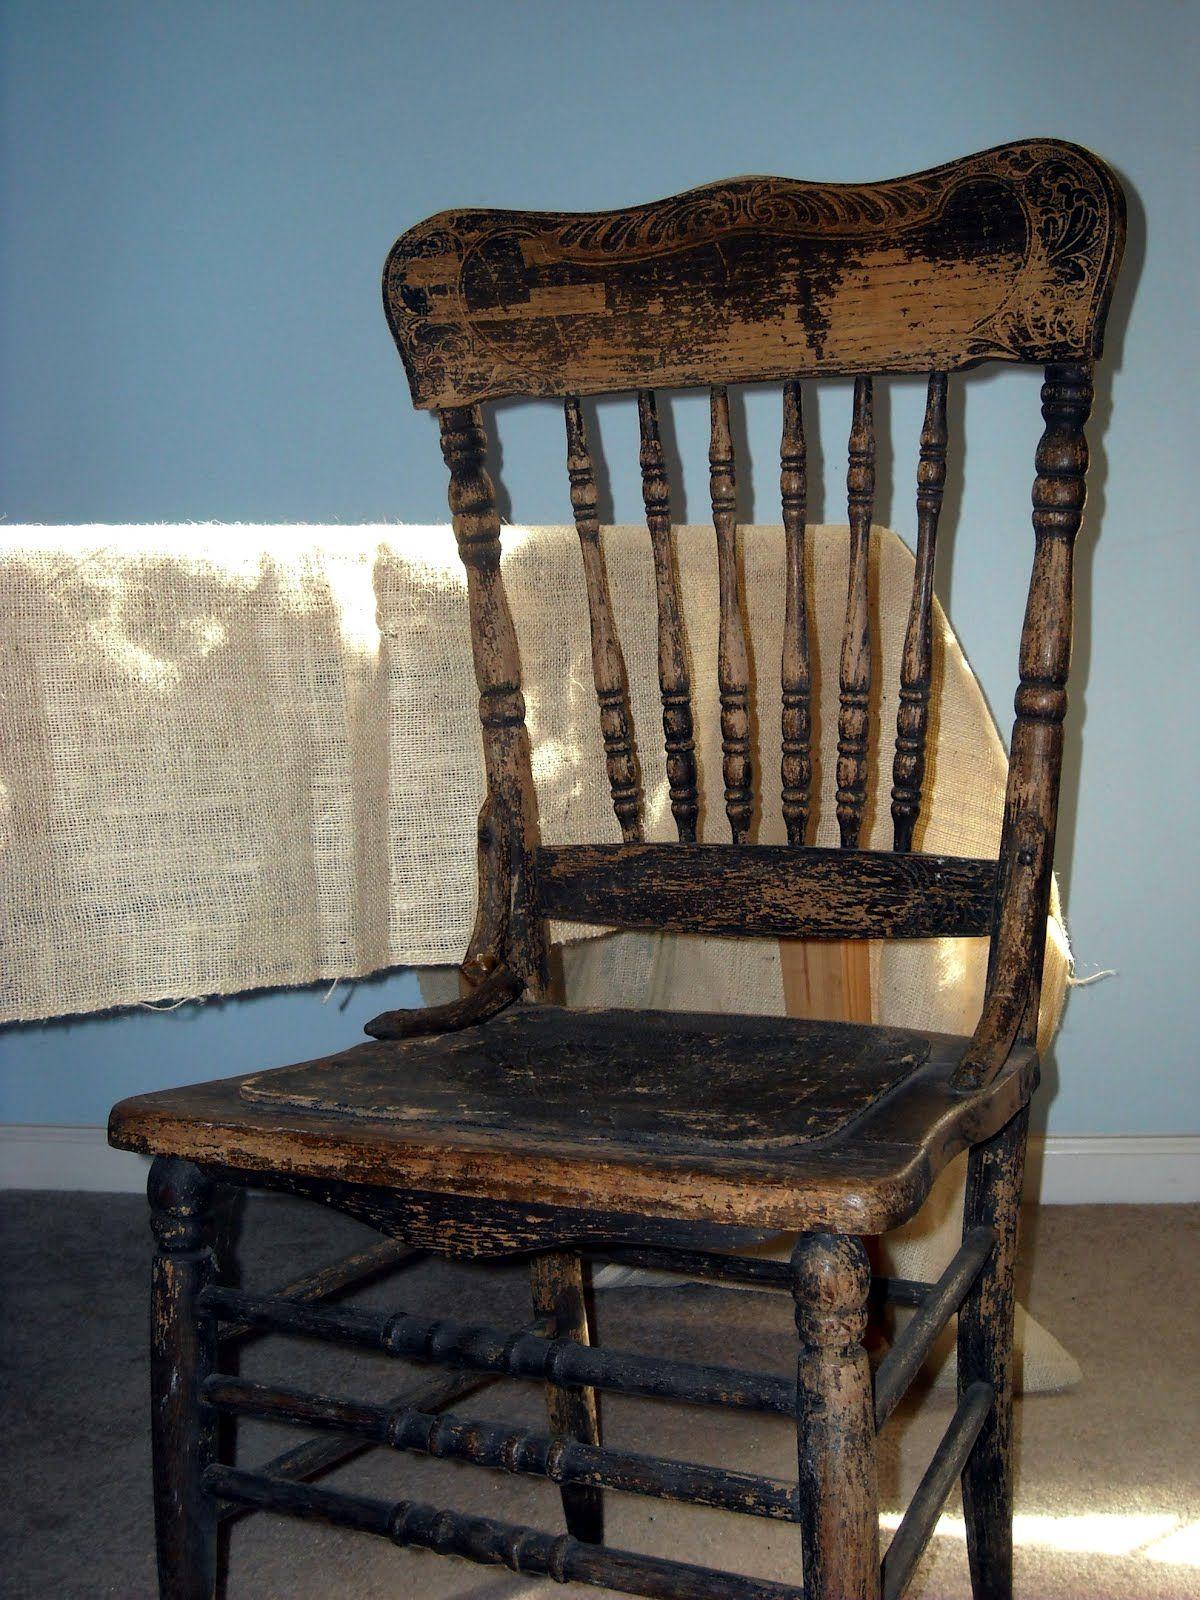 Dixie Farm Girl: Even an Old Chair - Dixie Farm Girl: Even An Old Chair Old Benches ♥ Stools ♥ Chairs